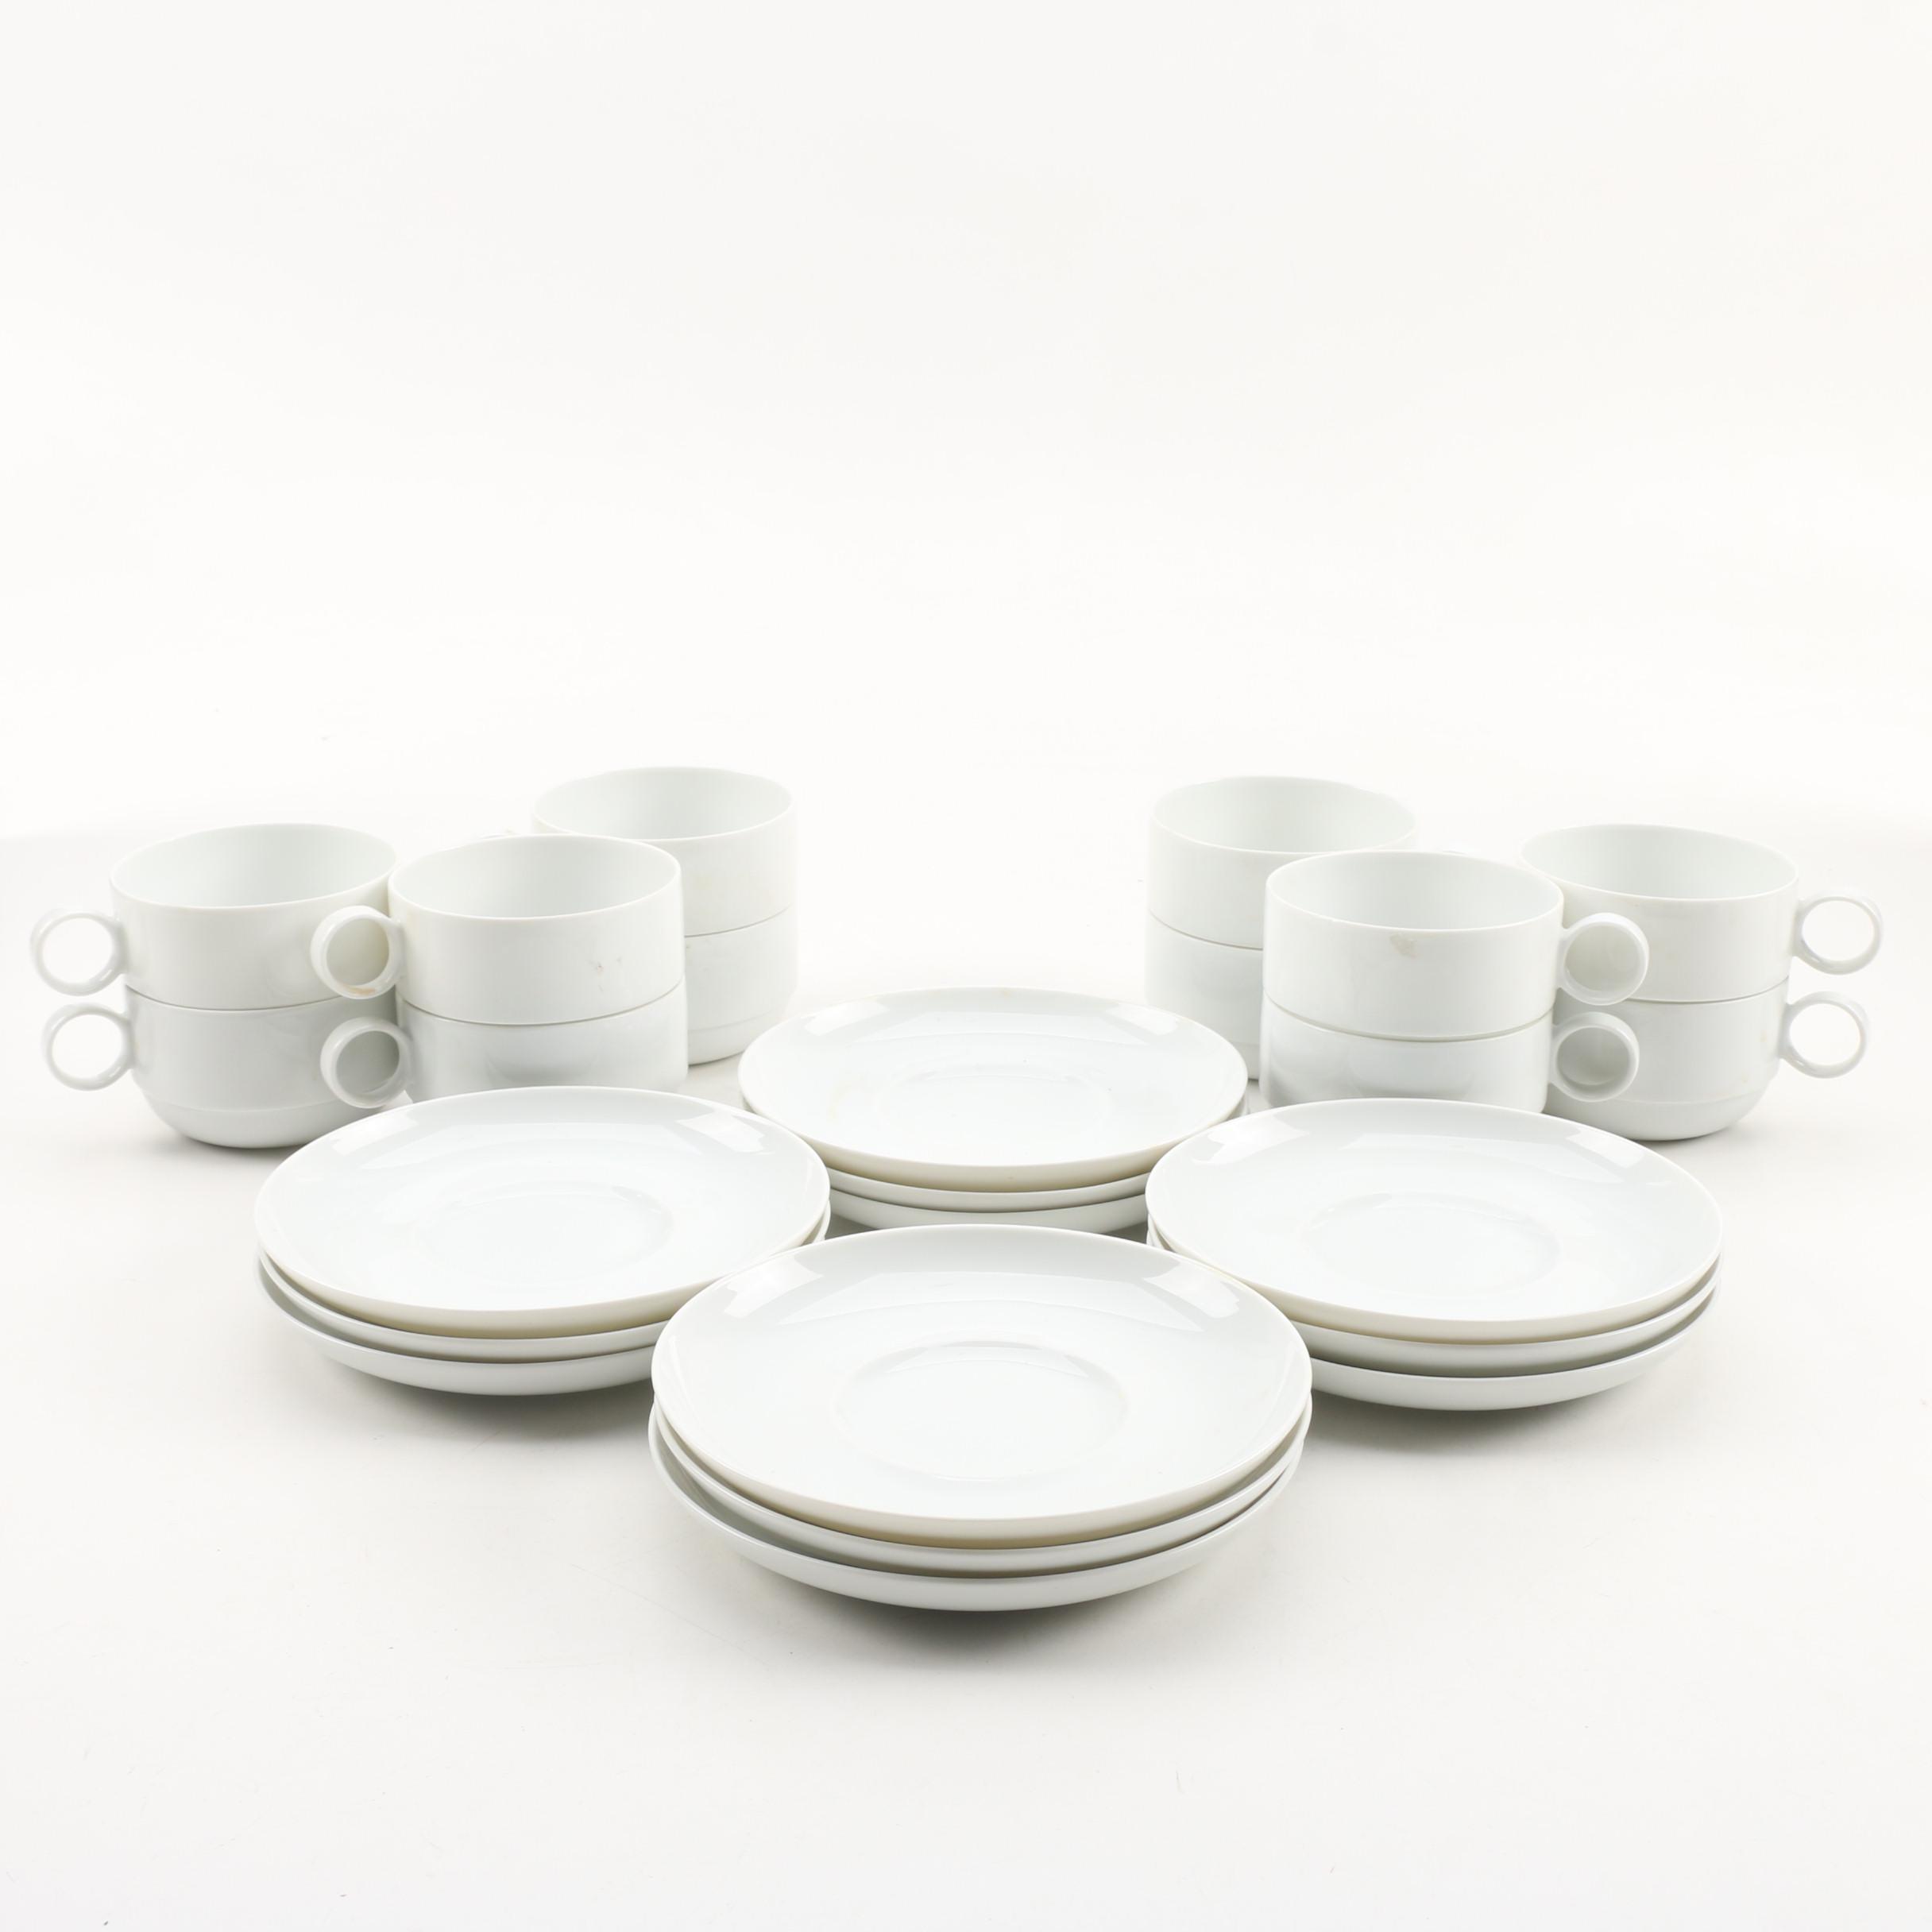 Rosenthal Porcelain Teacups and Saucers